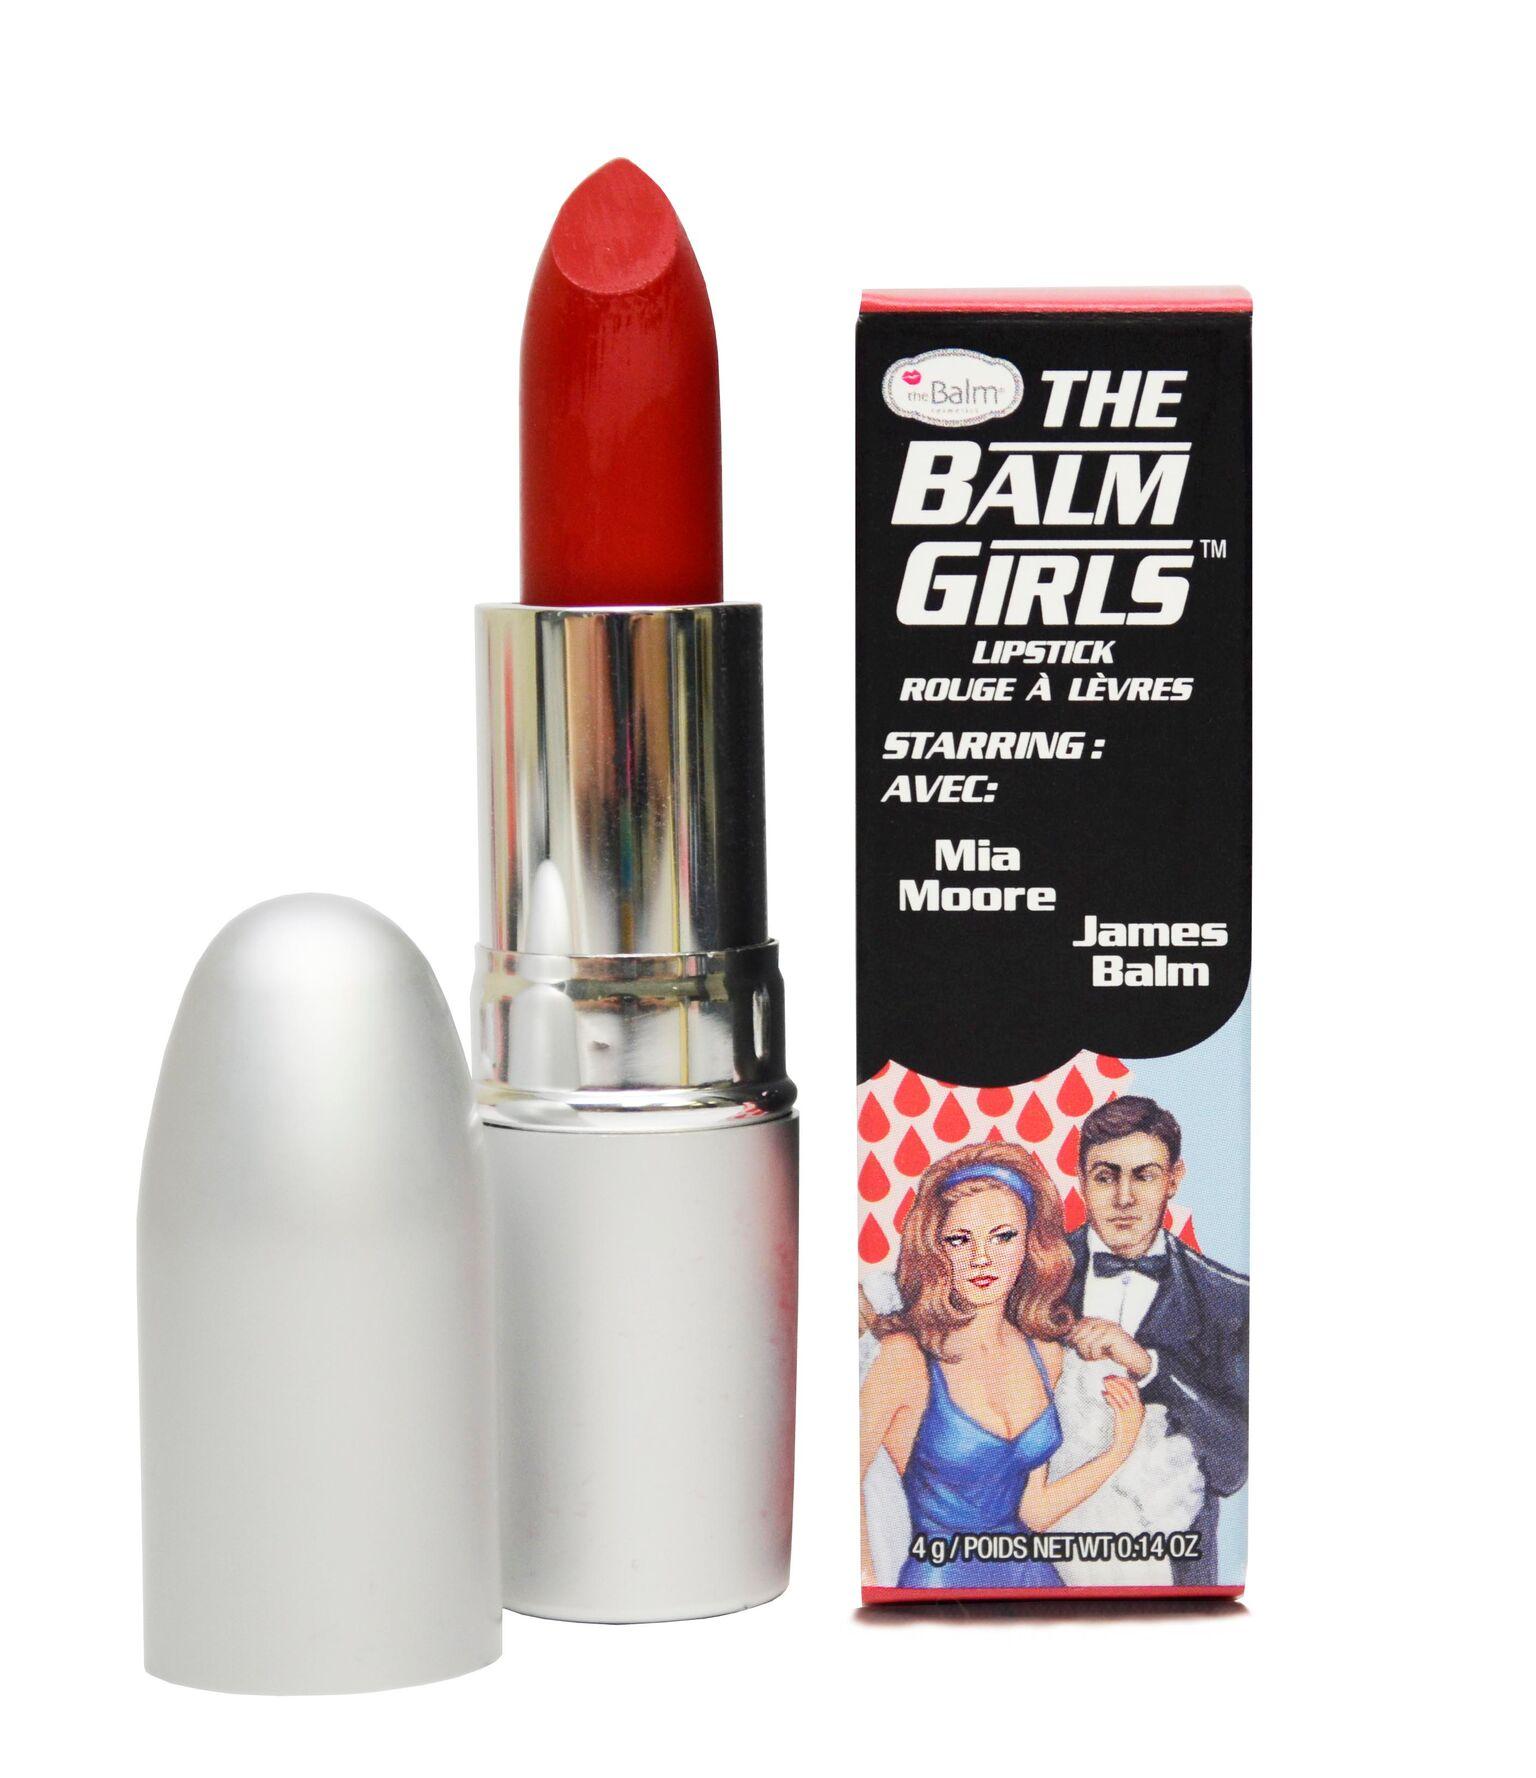 Girls Lipstick Balm Girl Mia More